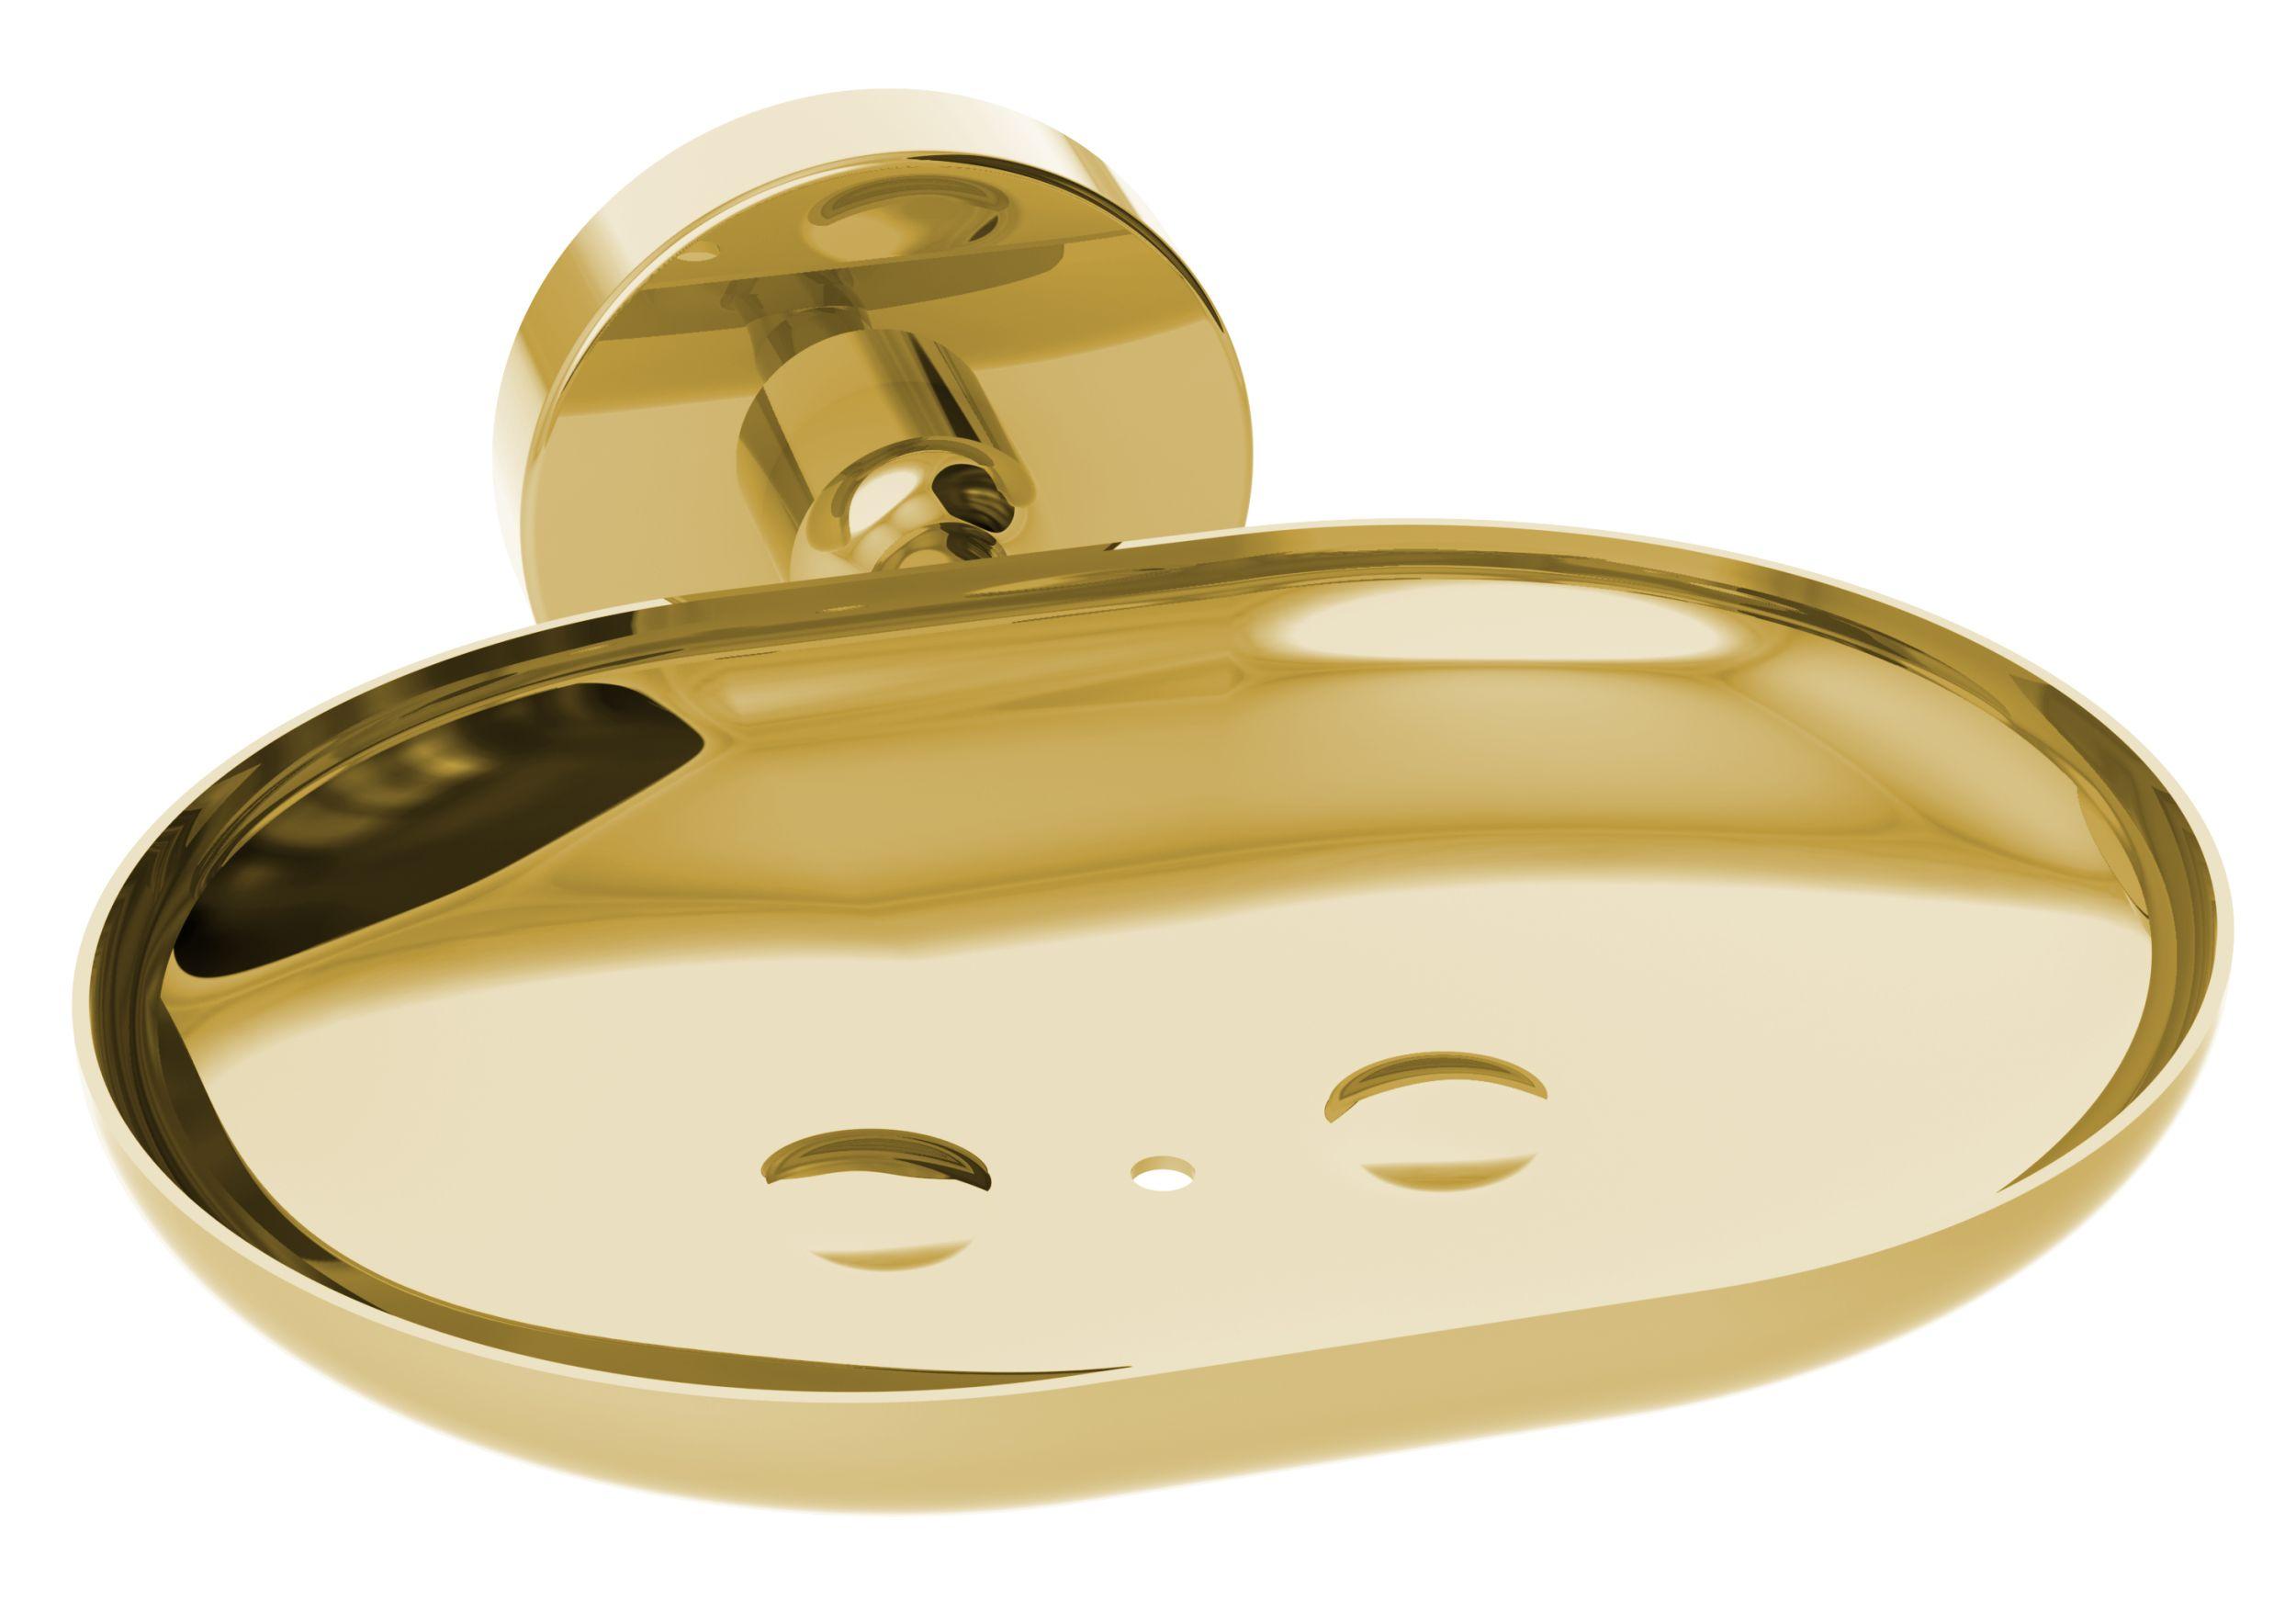 Porte-savon en inox à fixer